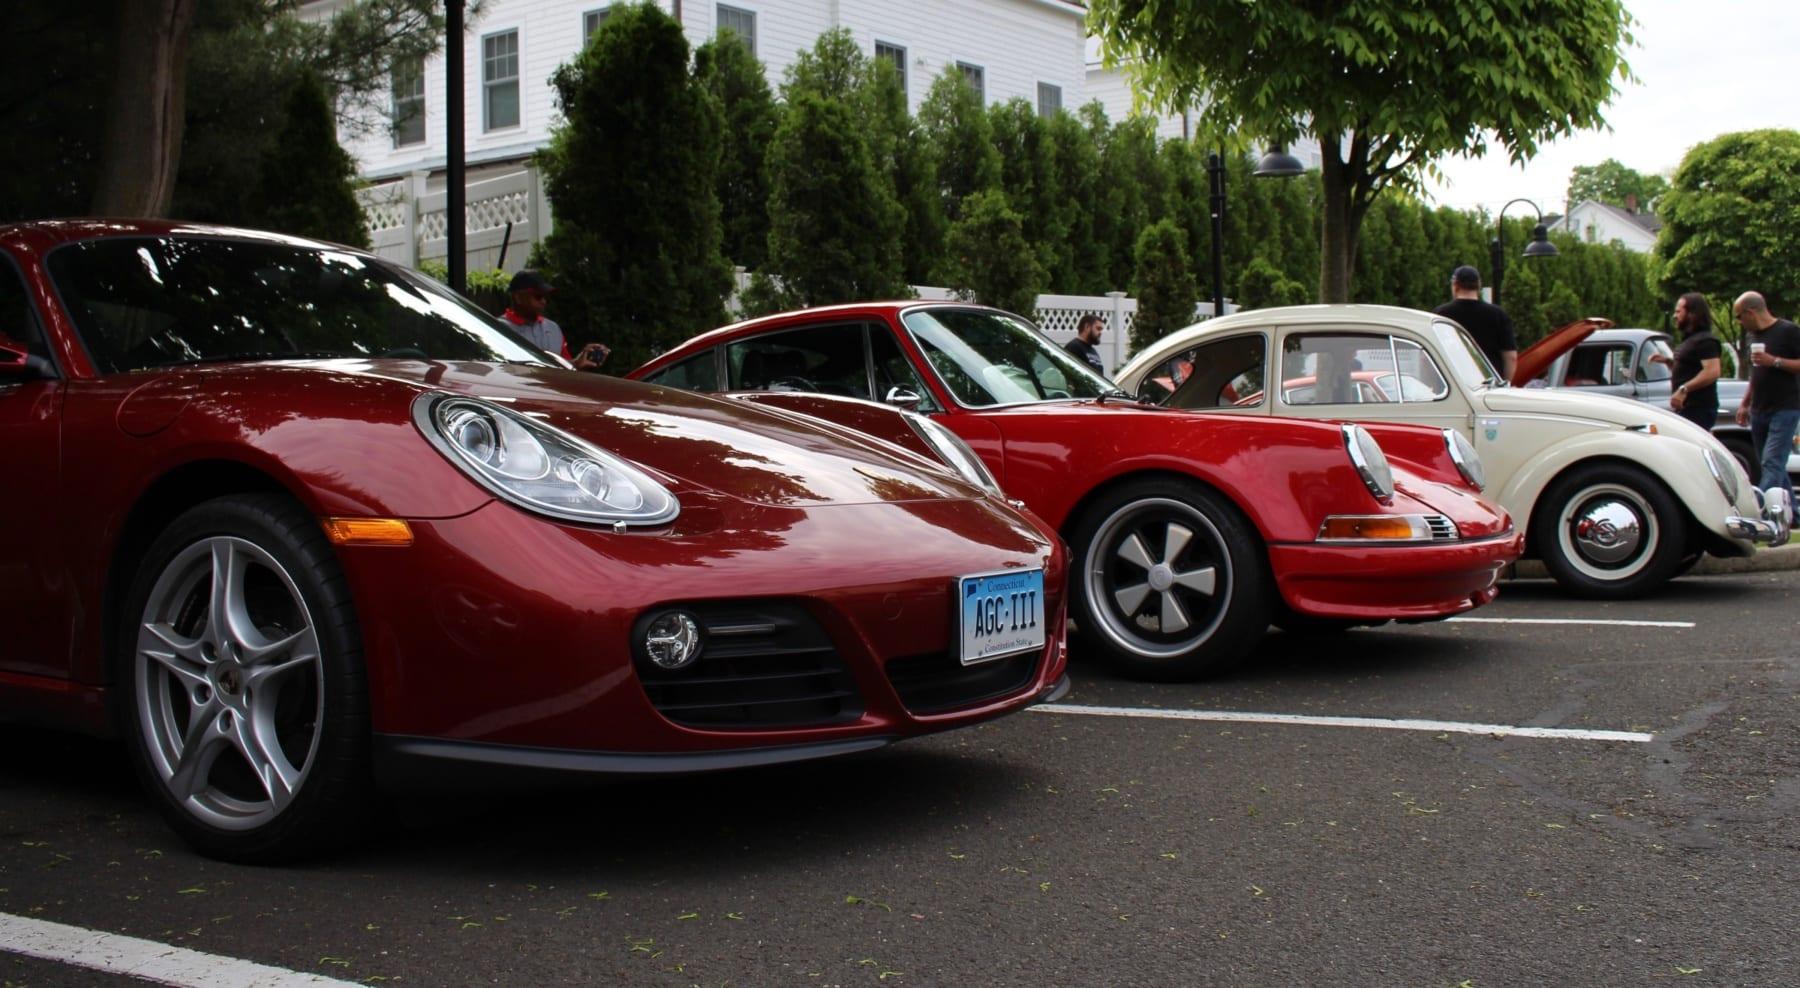 Porsche and VW